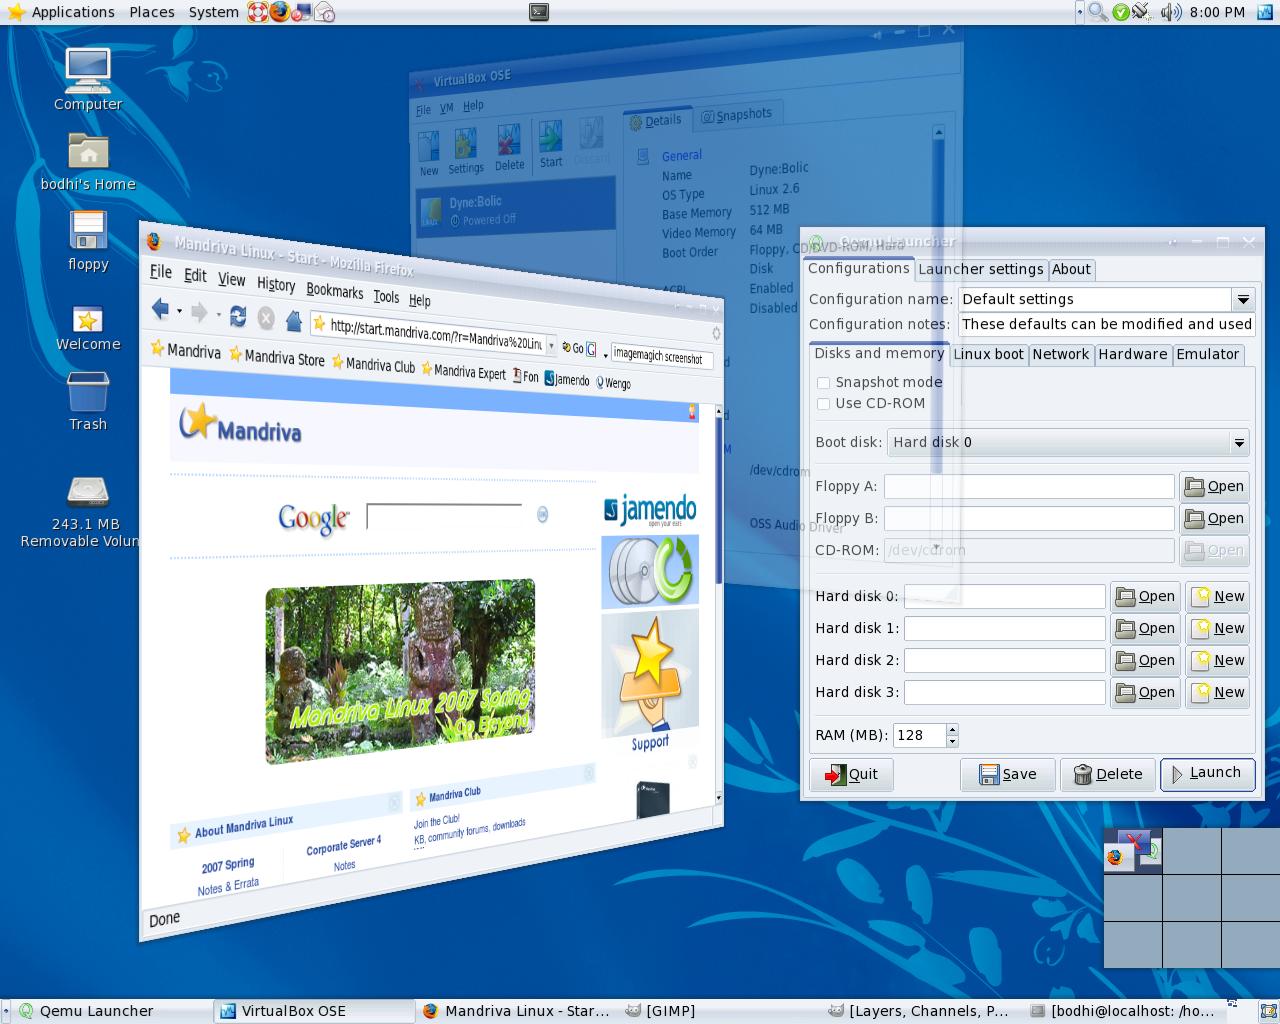 Mandriva 2007 Spring packs a punch - Linux com